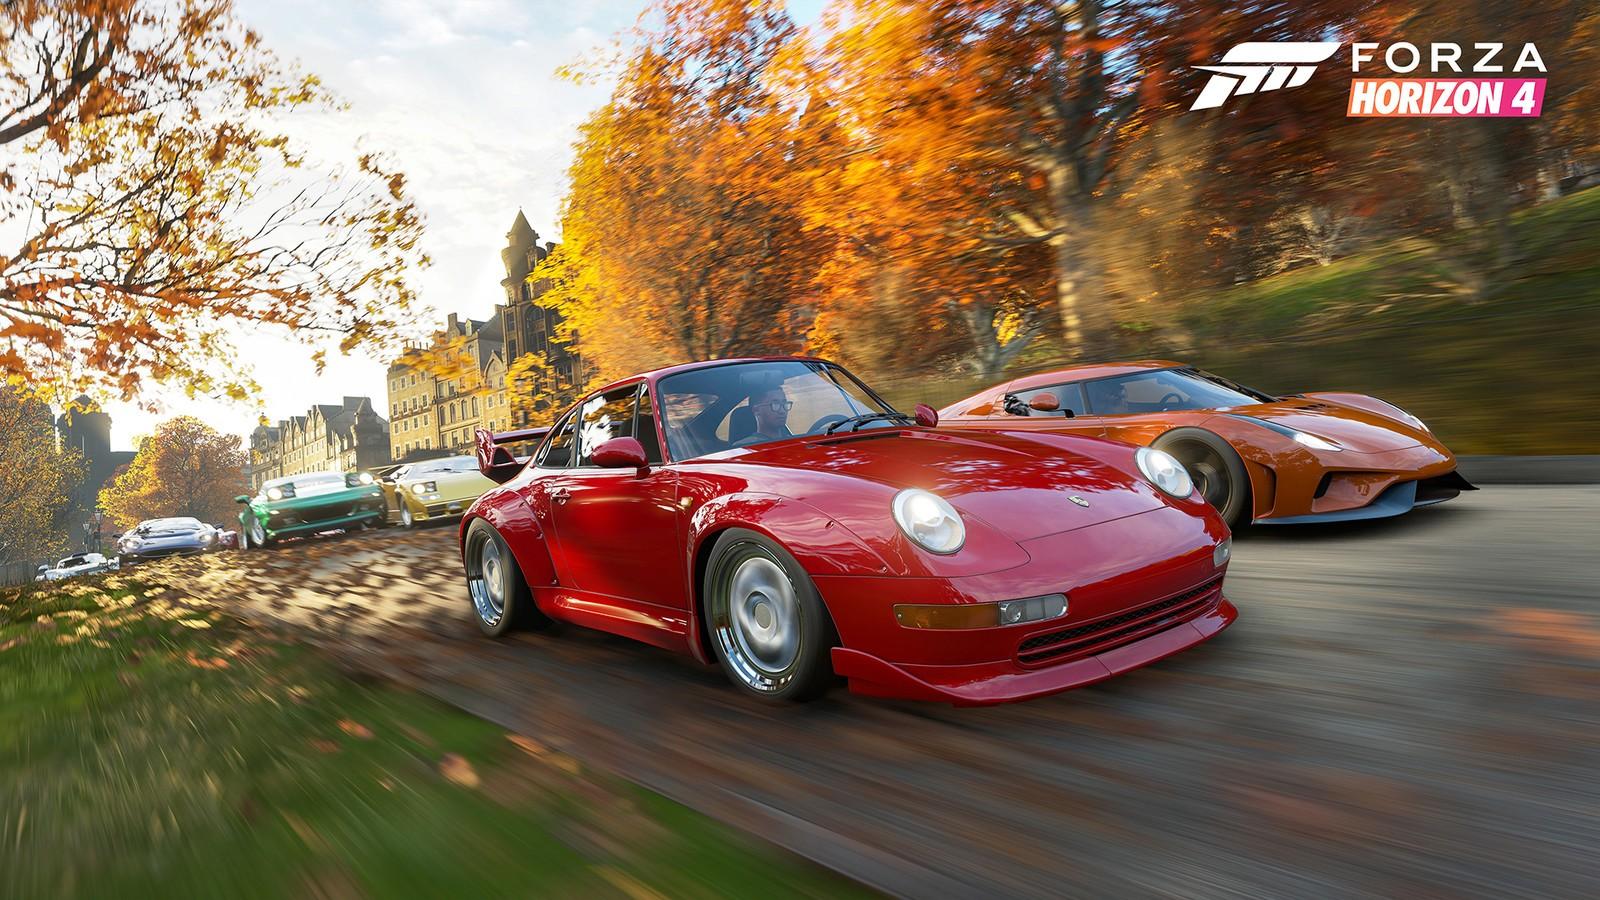 Forza Horizon 4 brings the racing to the UK.